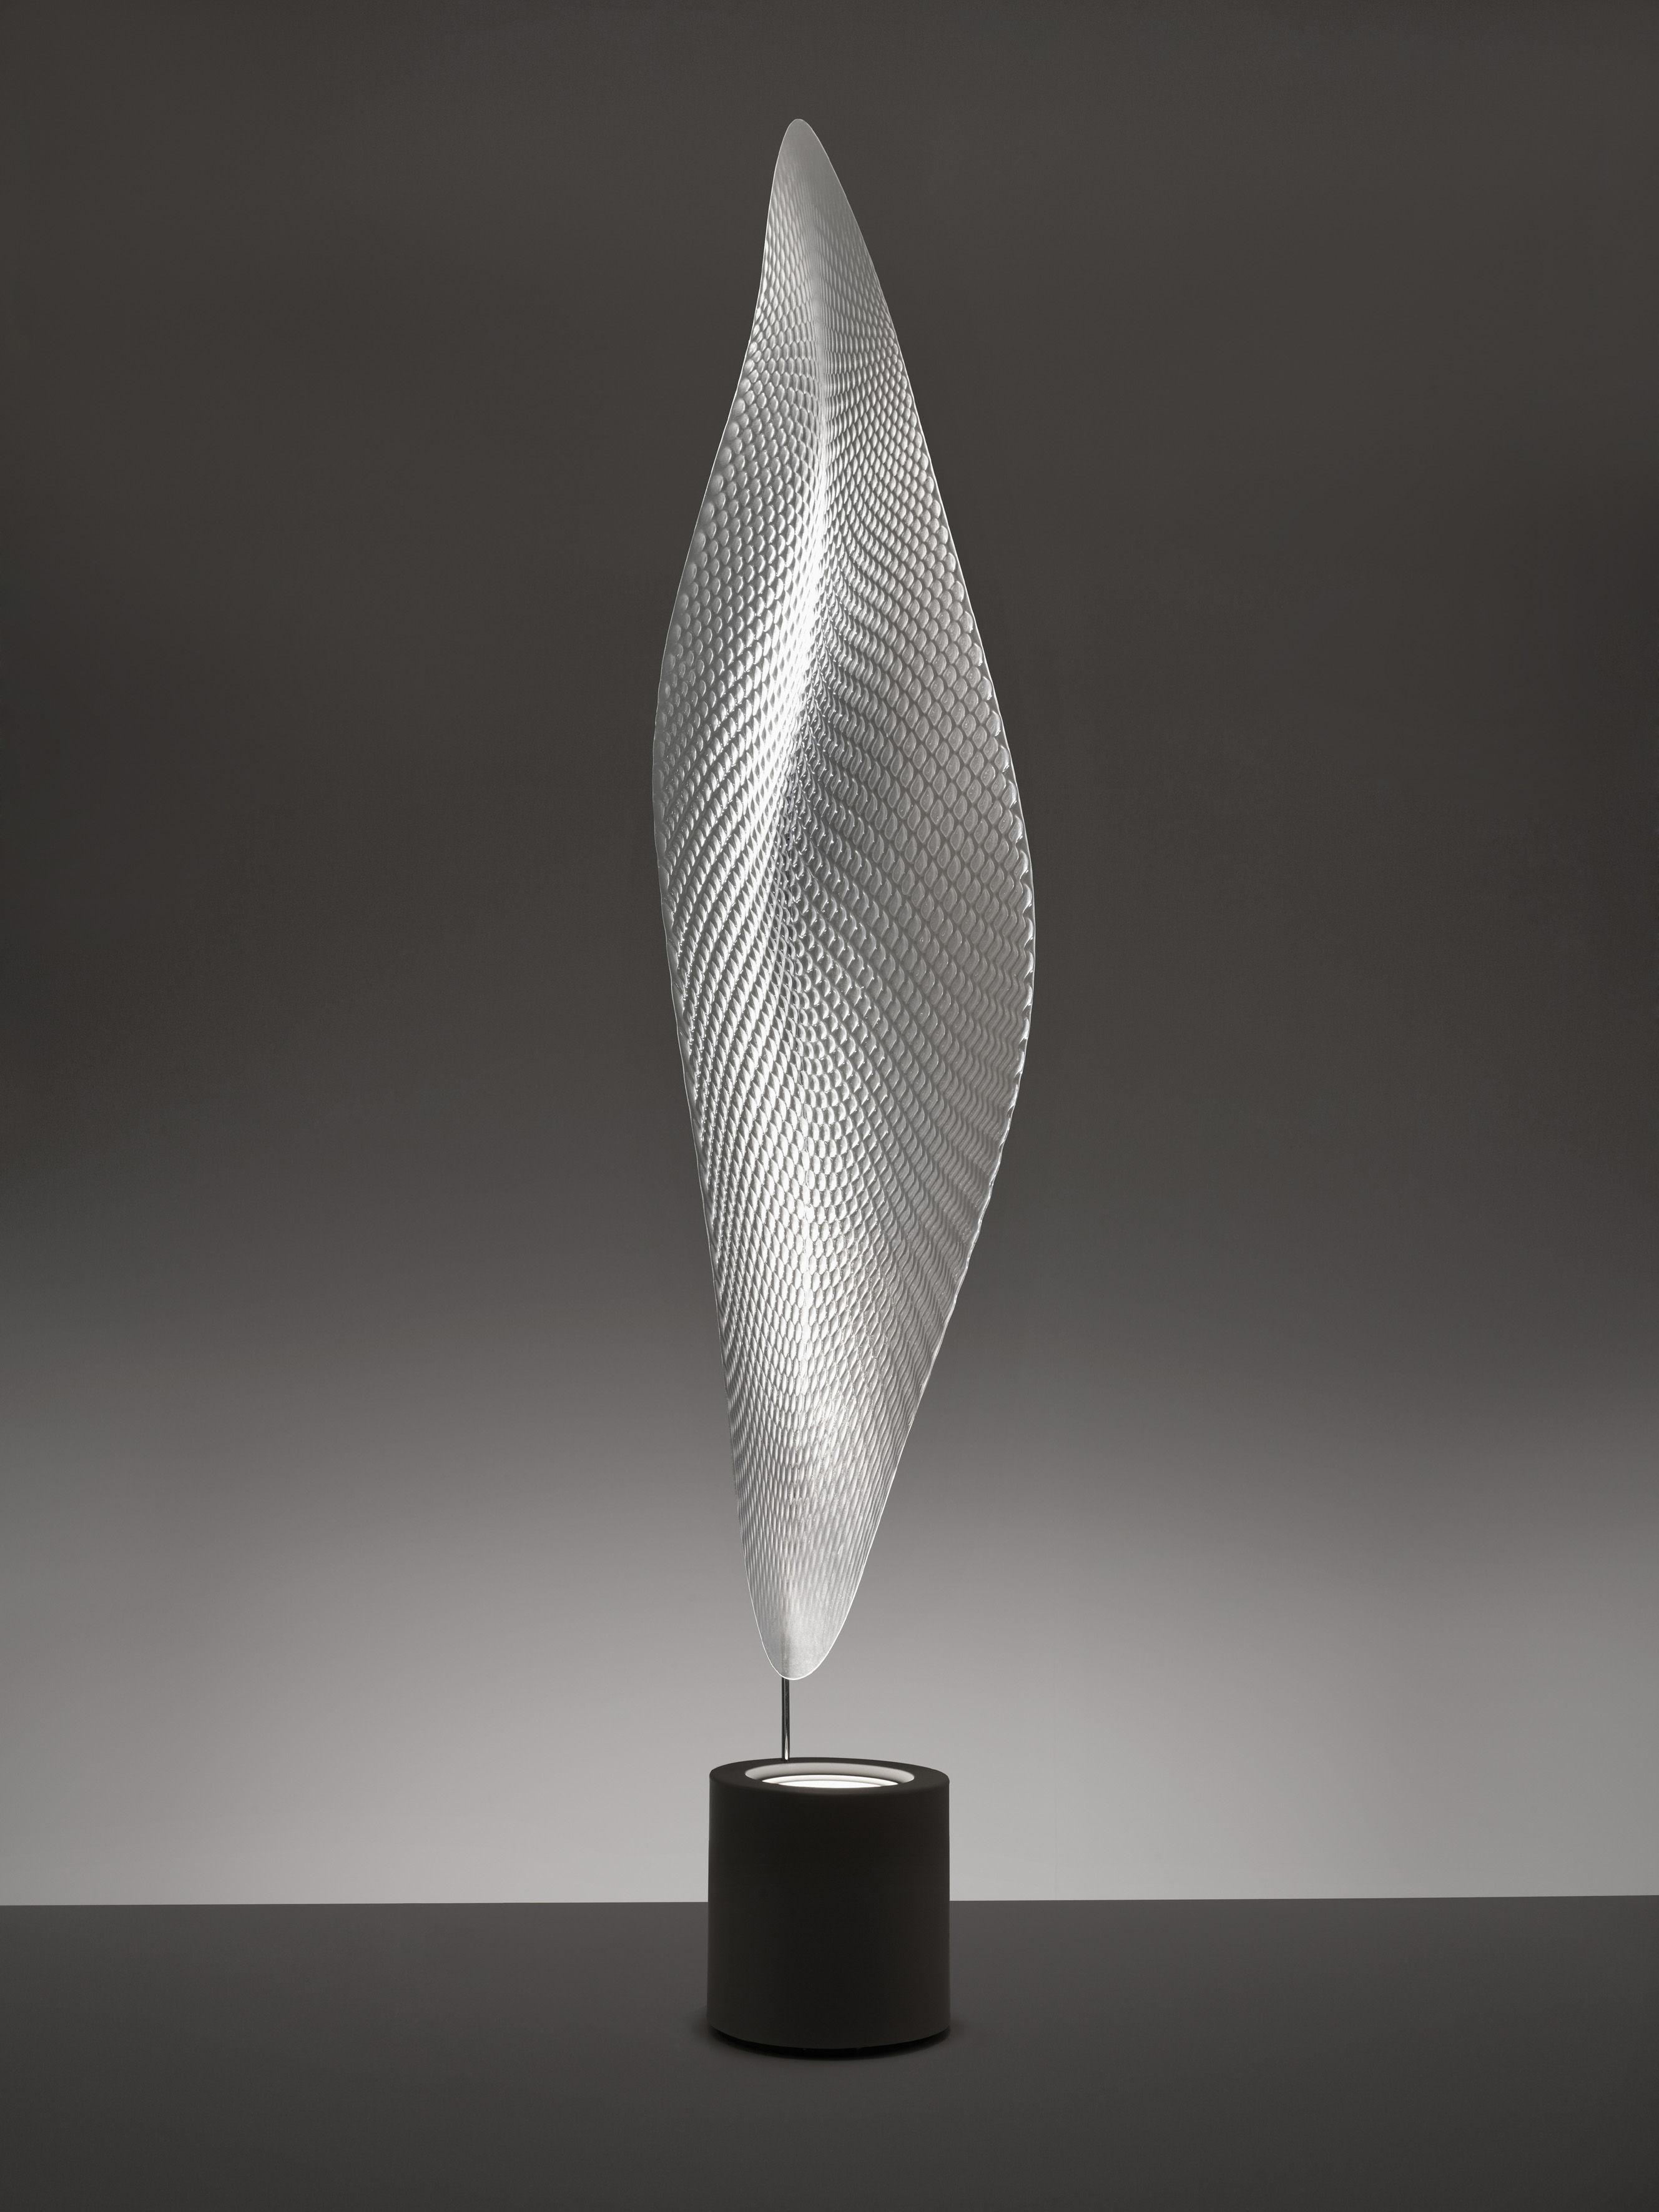 Floor Lamp Cosmic Leaf By Artemide Grey Transparent